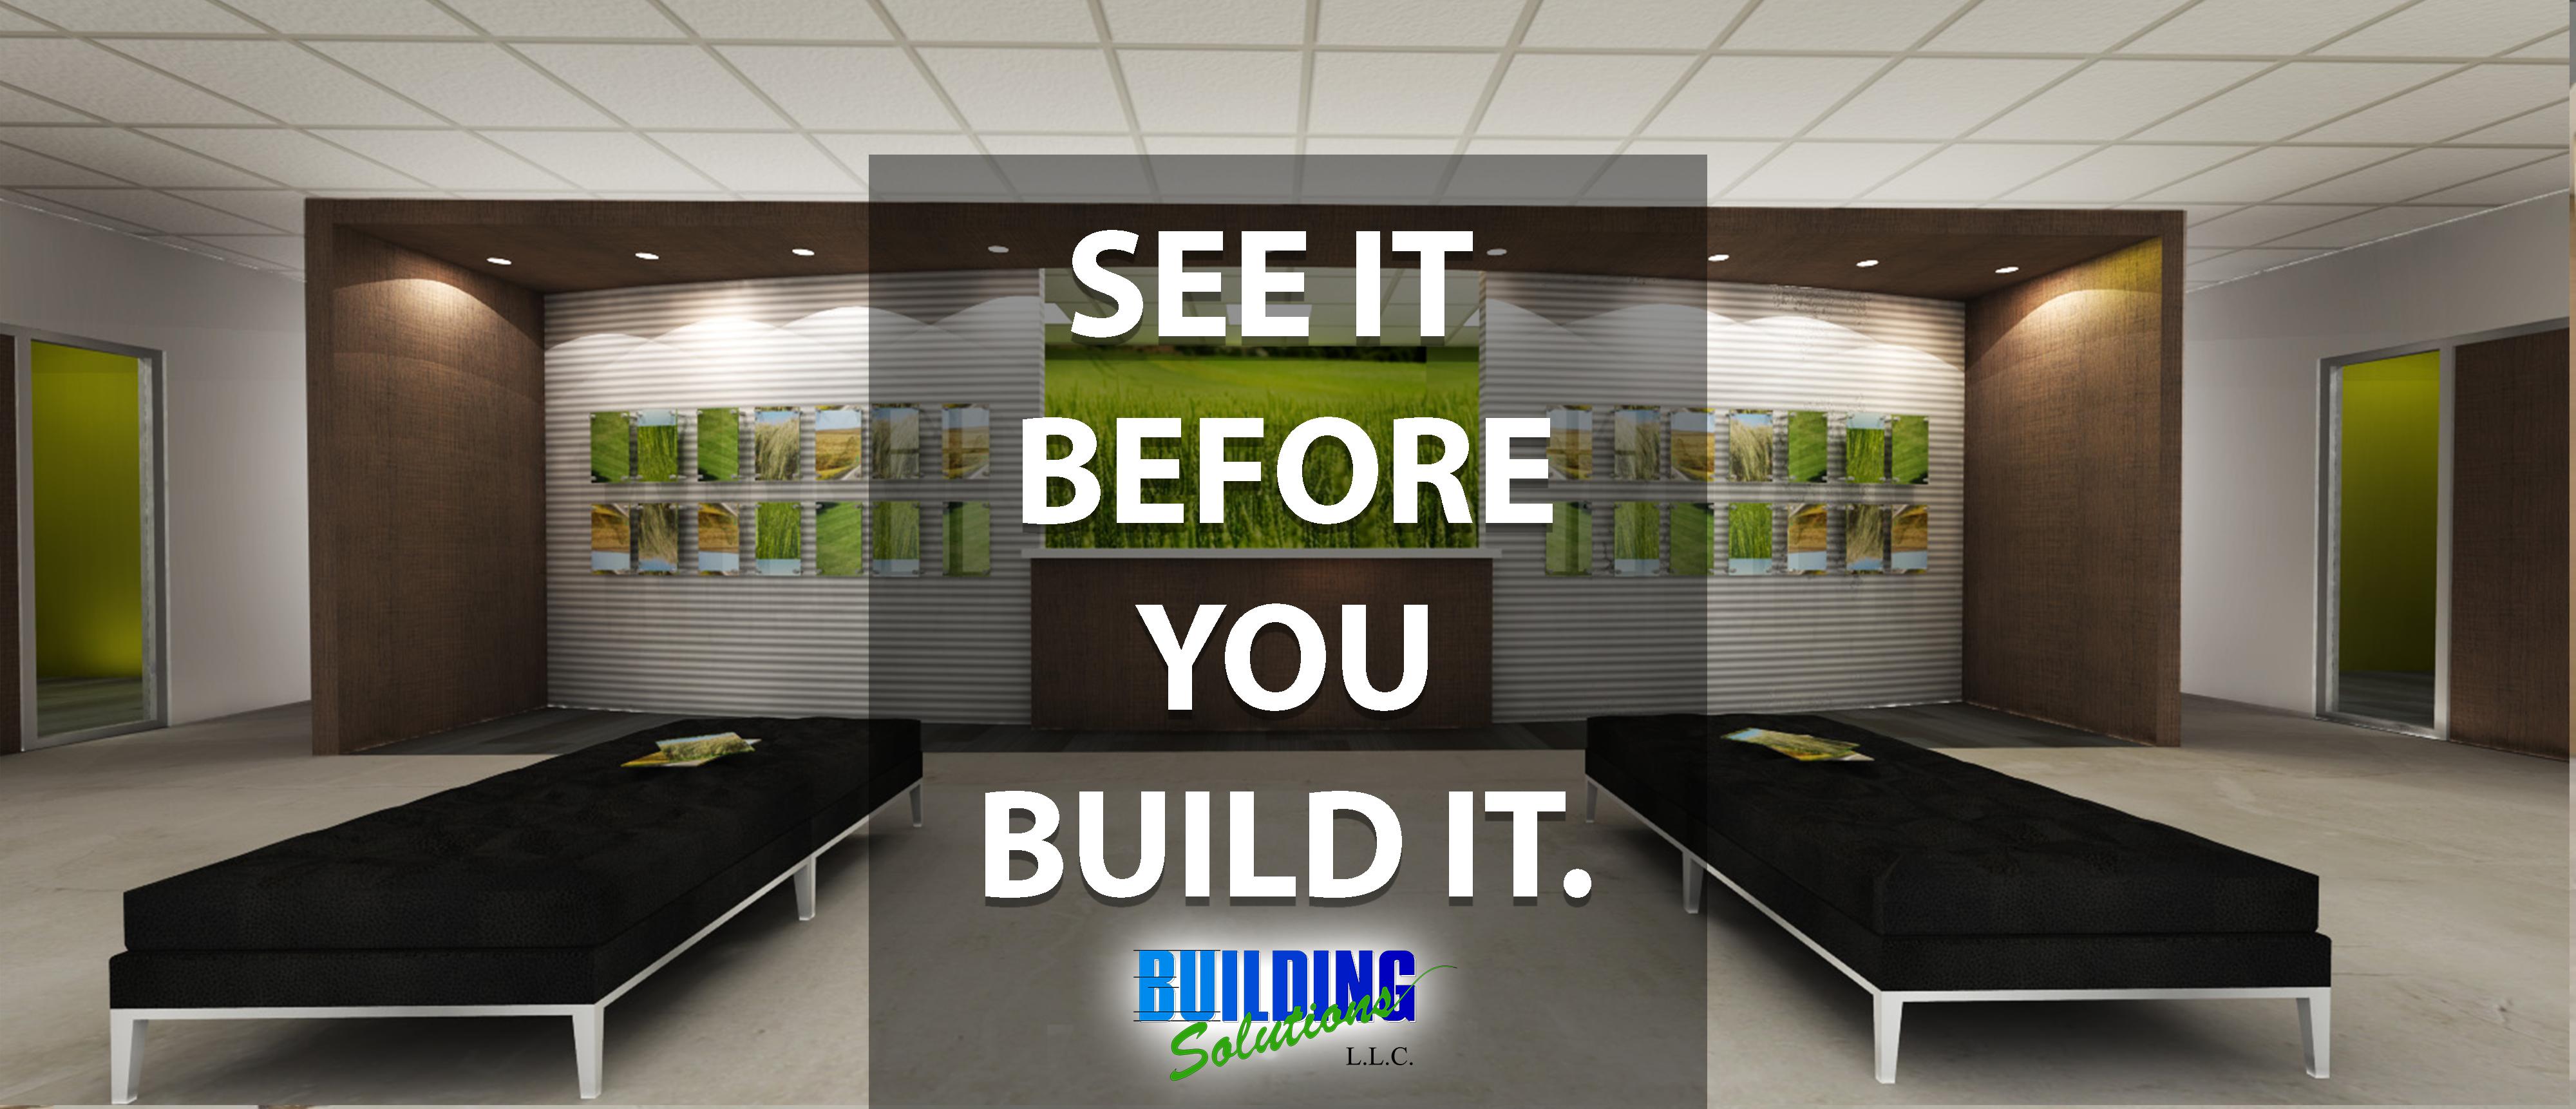 Building Solutions, LLC image 1